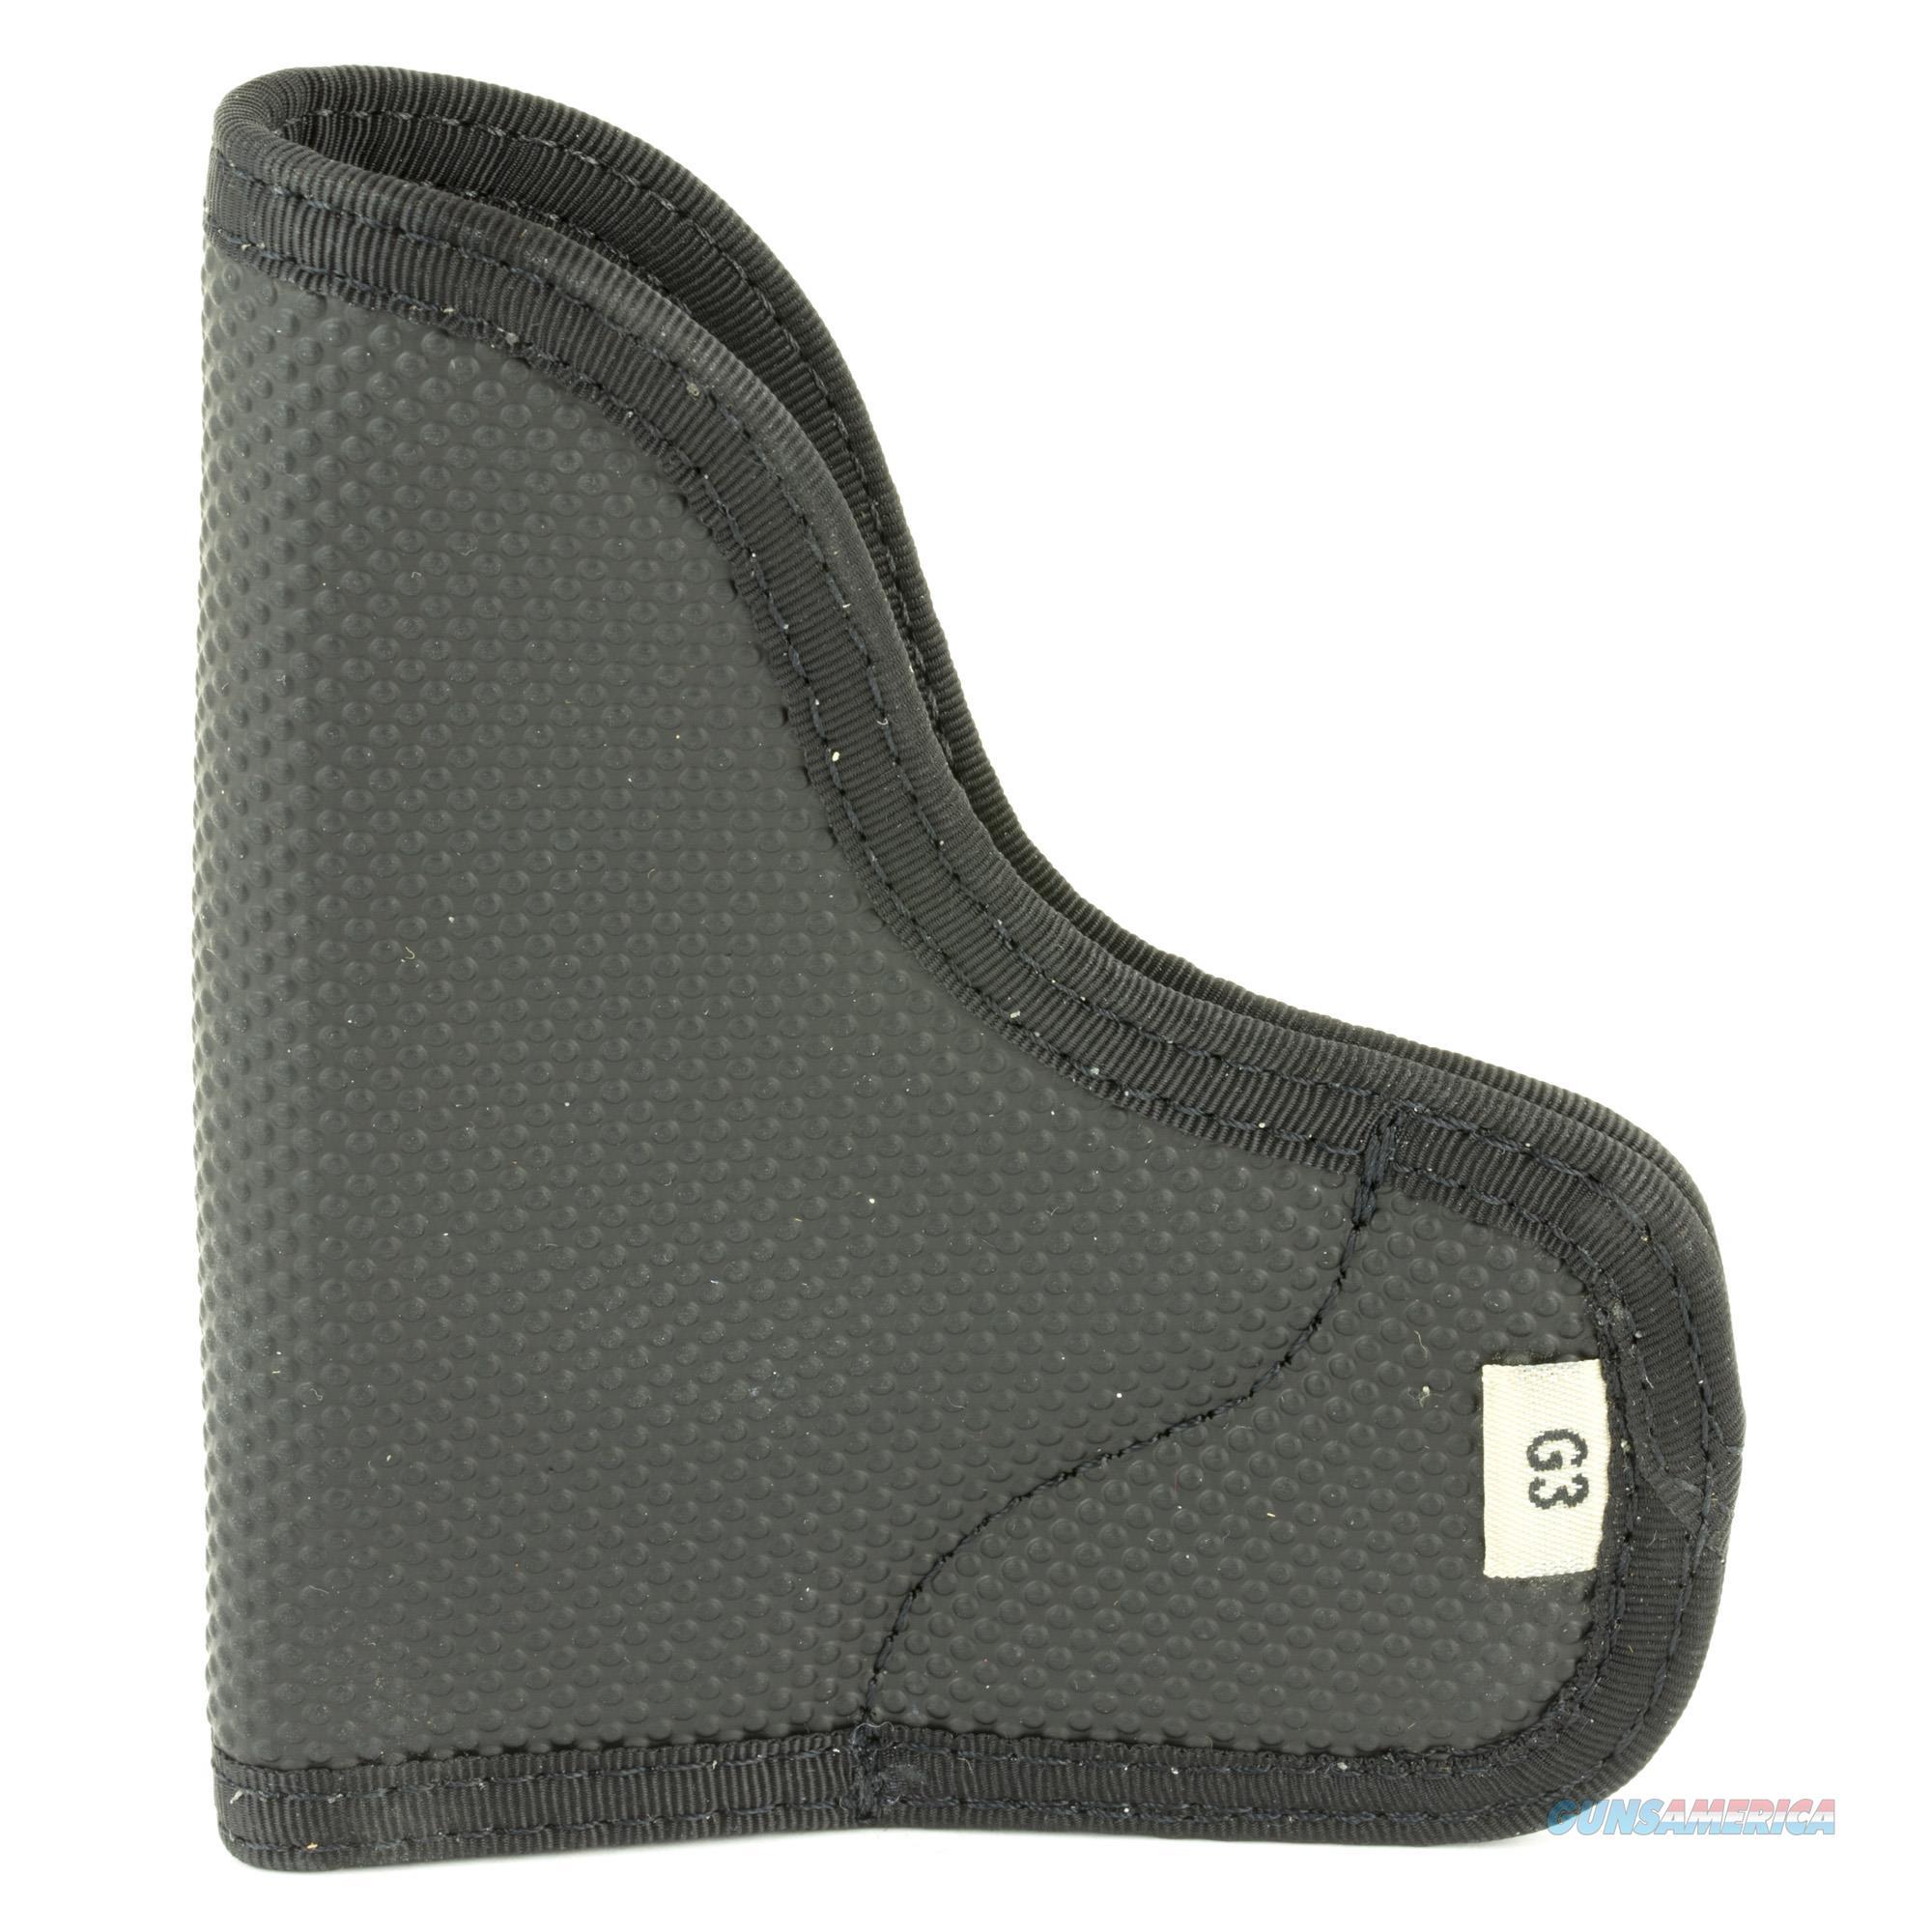 DeSantis N38BJG3Z0 Nemesis Pocket Holster – Ambidextrous, Black - Kel-Tec/Ruger/Taurus  Non-Guns > Holsters and Gunleather > Concealed Carry